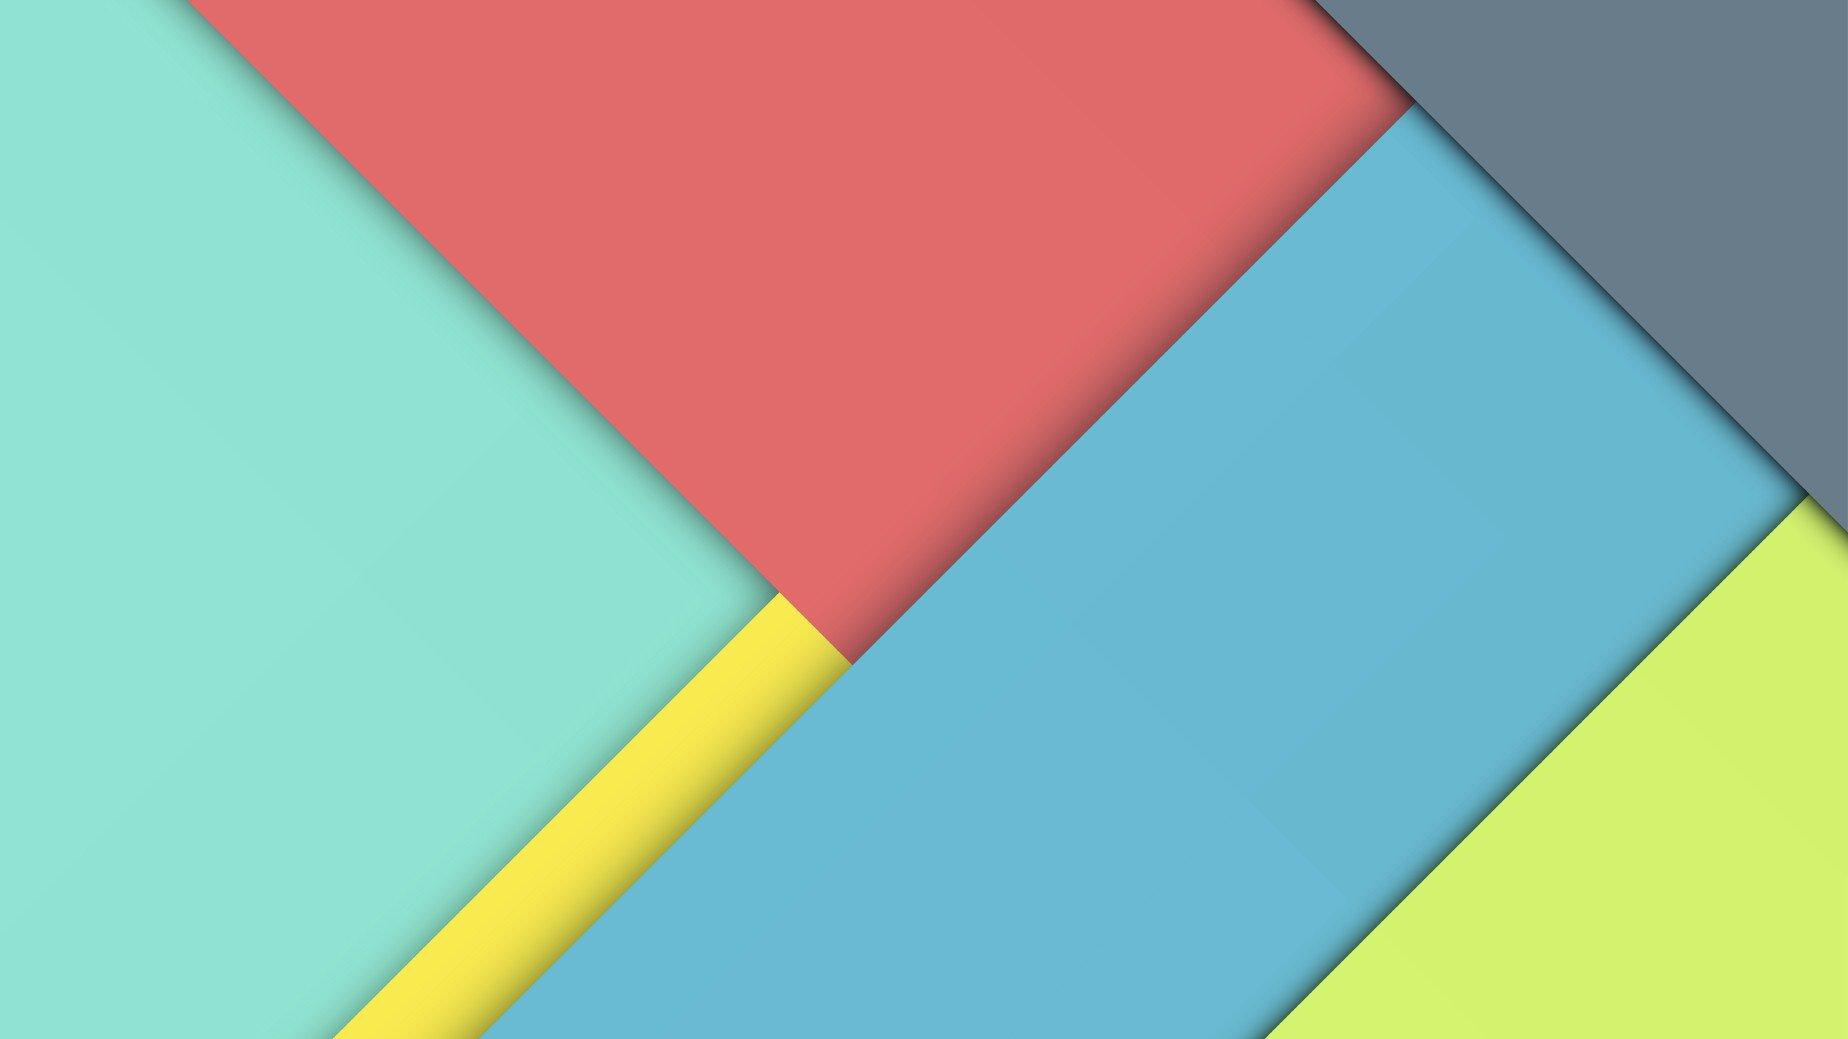 Material Design Hd Hd Artist 4k Wallpapers Images